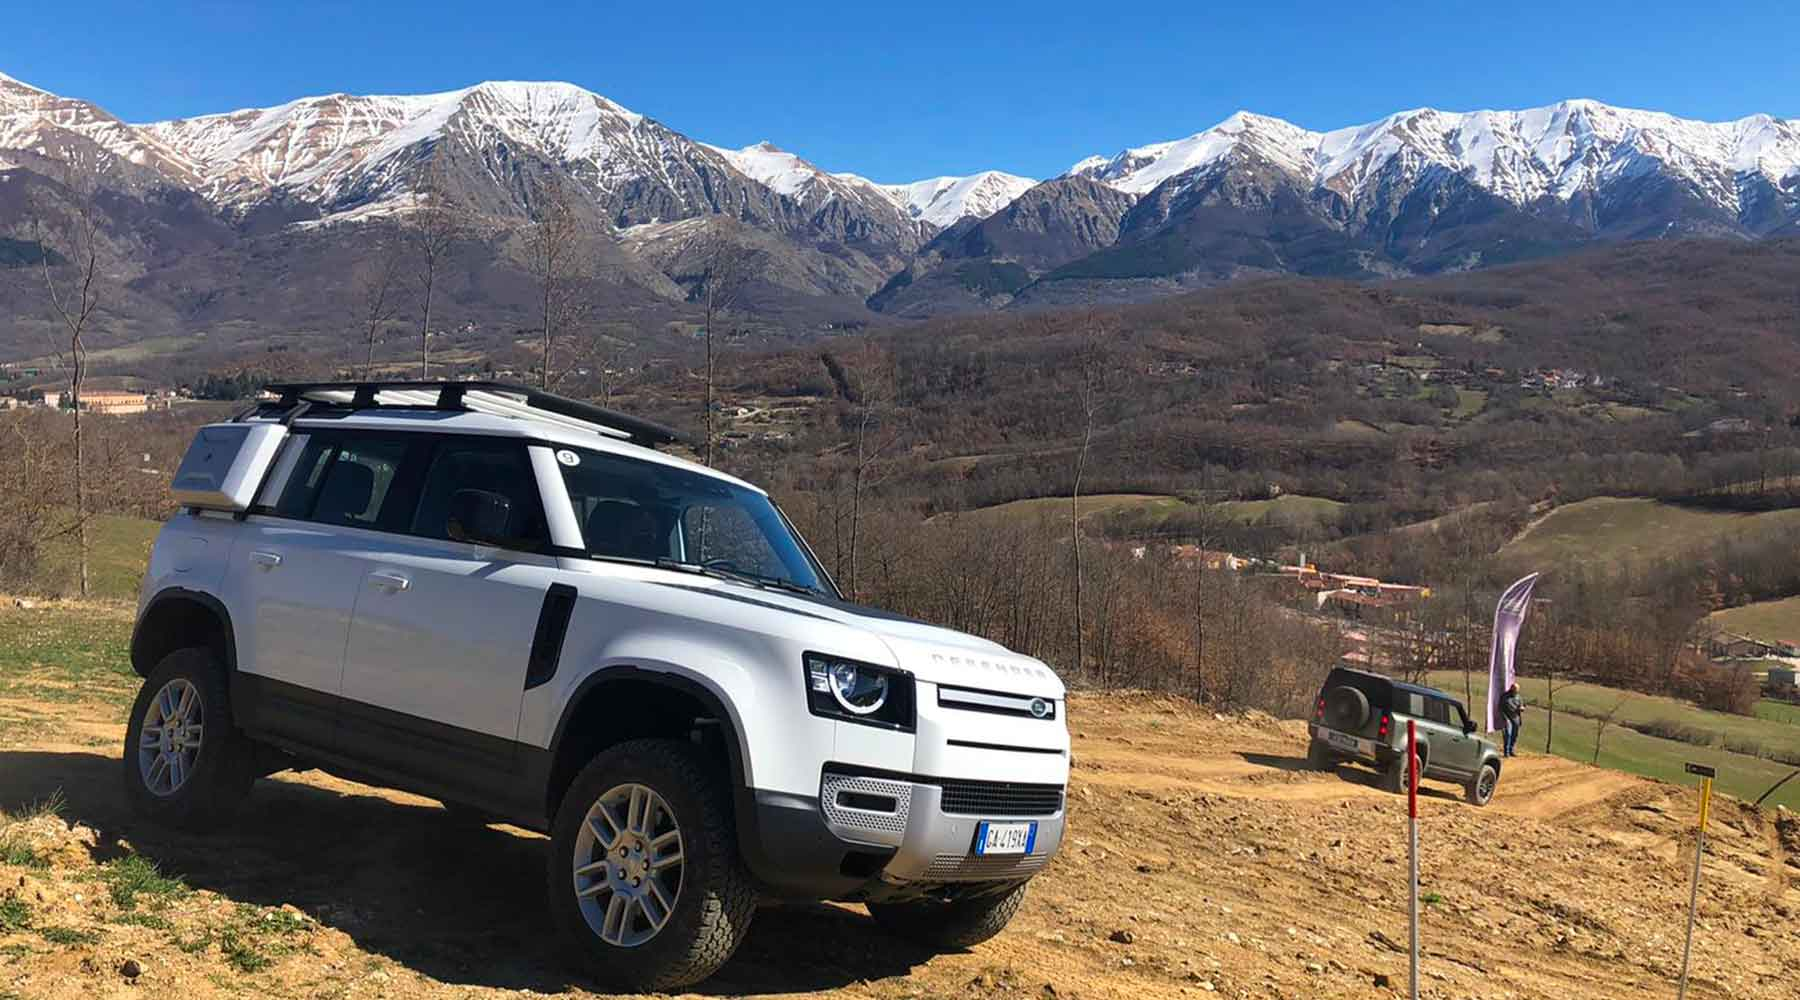 Amatrice_Land_Rover_Experience_Italia